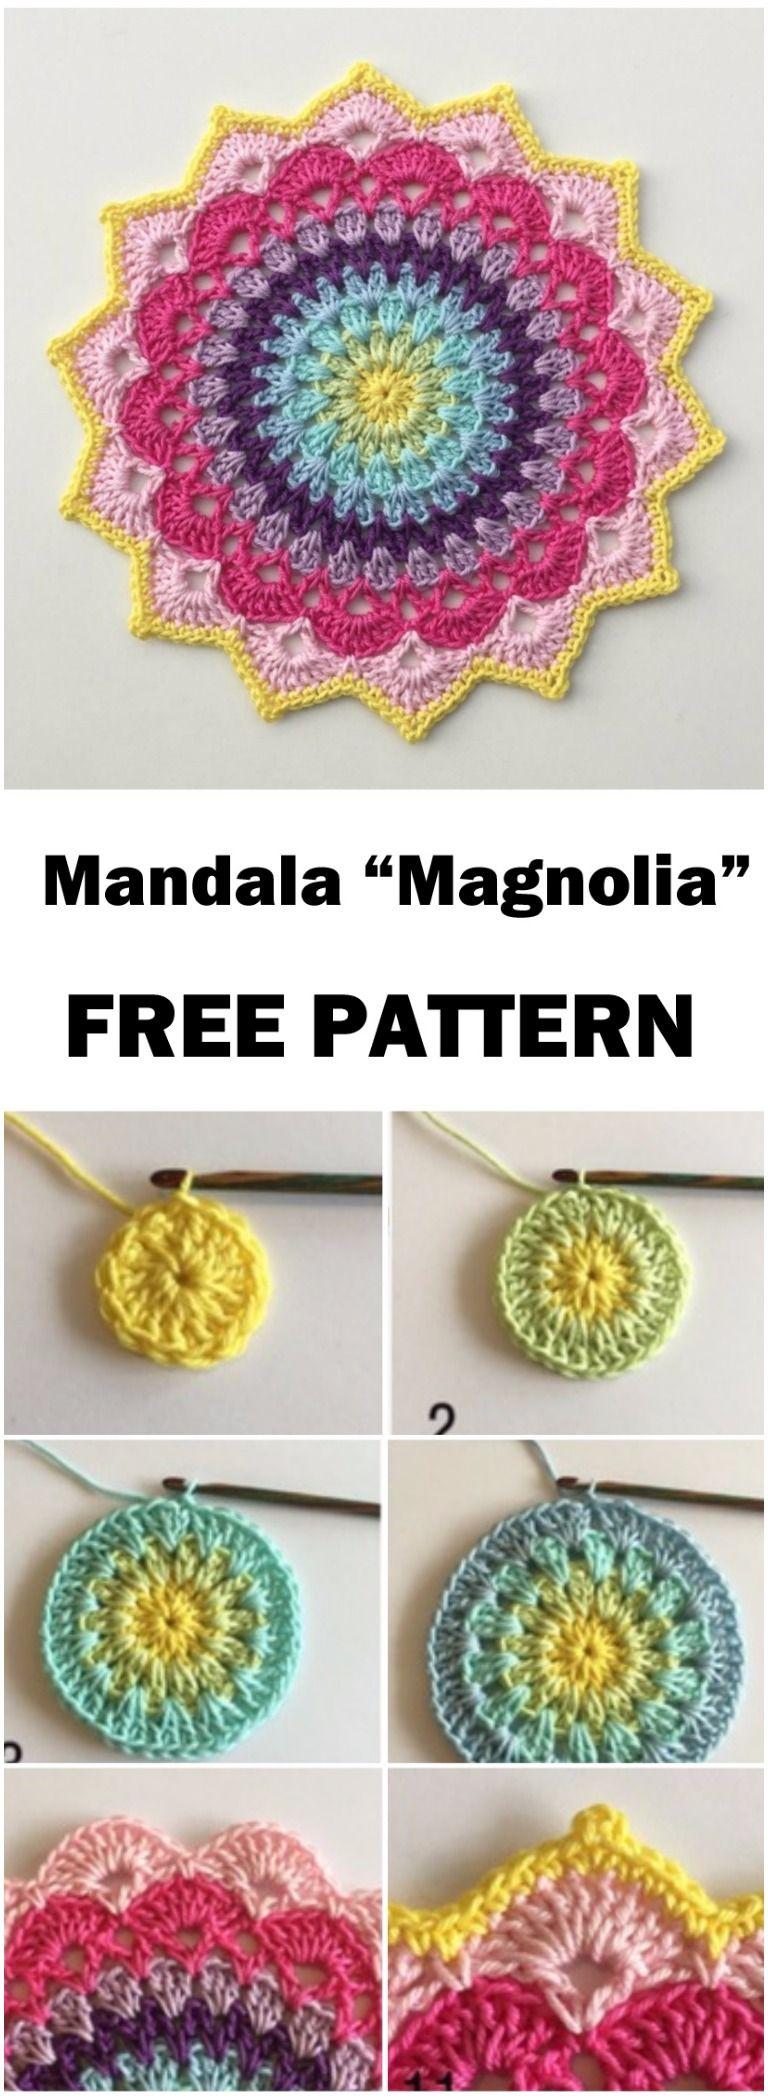 "Mandala ""Magnolia"" – Free Pattern | Mandalas, Ganchillo y Tejido"